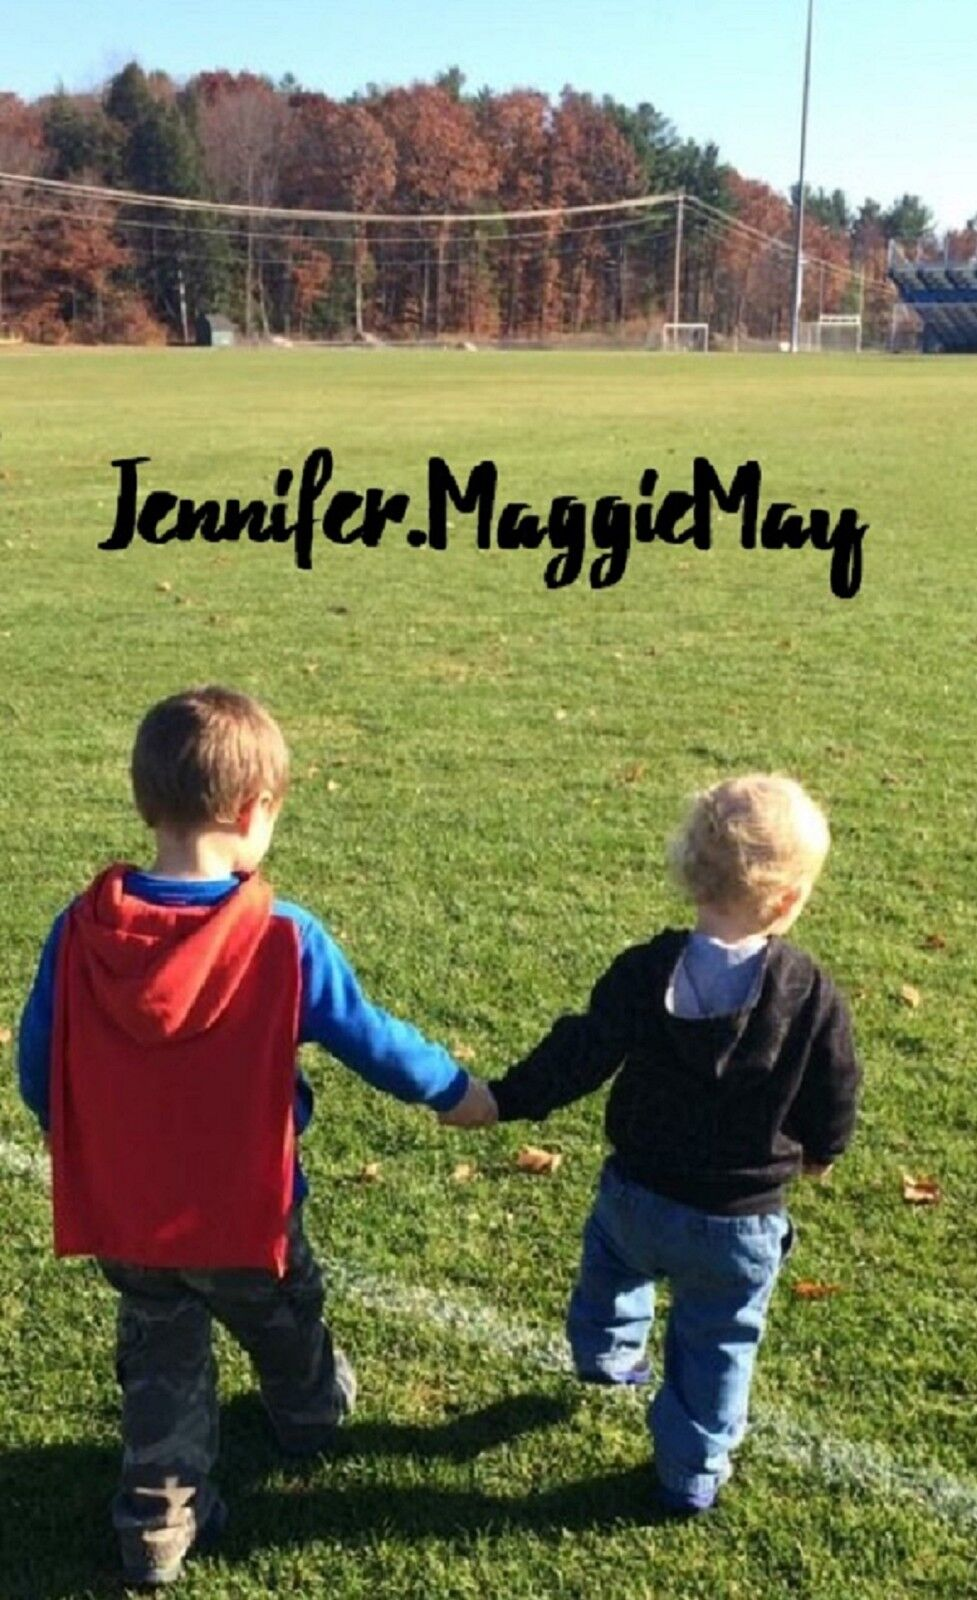 Jennifer.MaggieMay